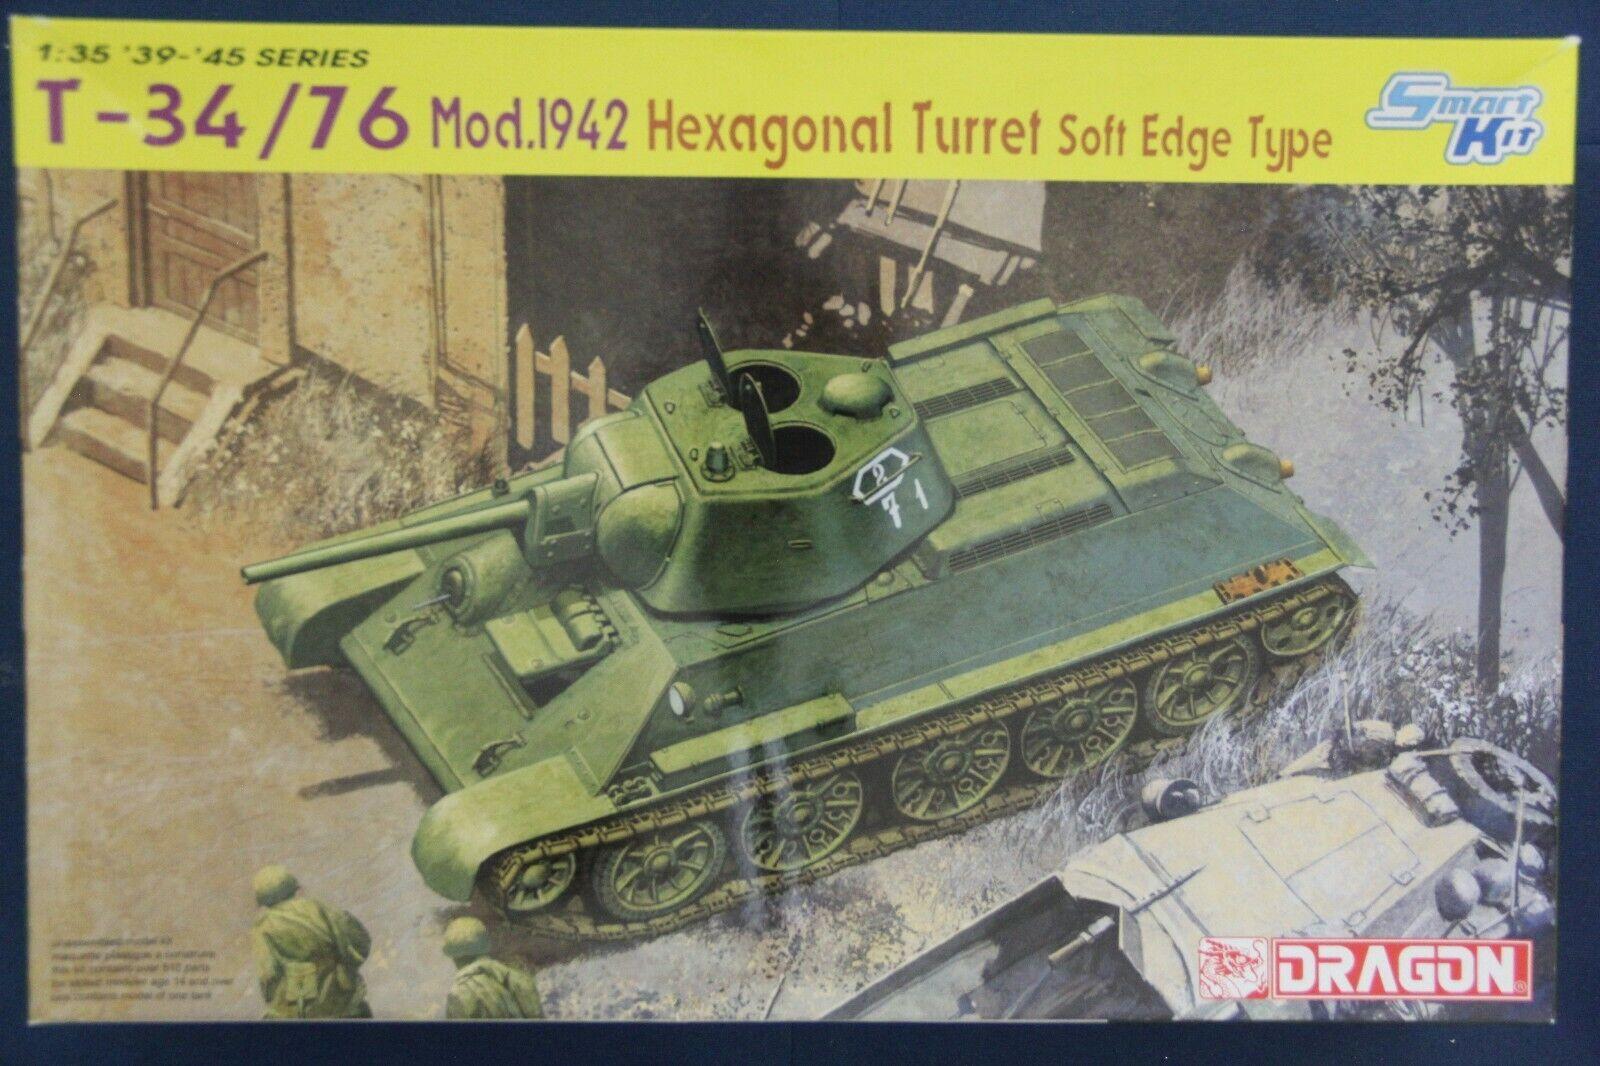 Dragon 6424 1 35 T-34 76 Mod.1942 Hexagonal Turret Soft Edge Type